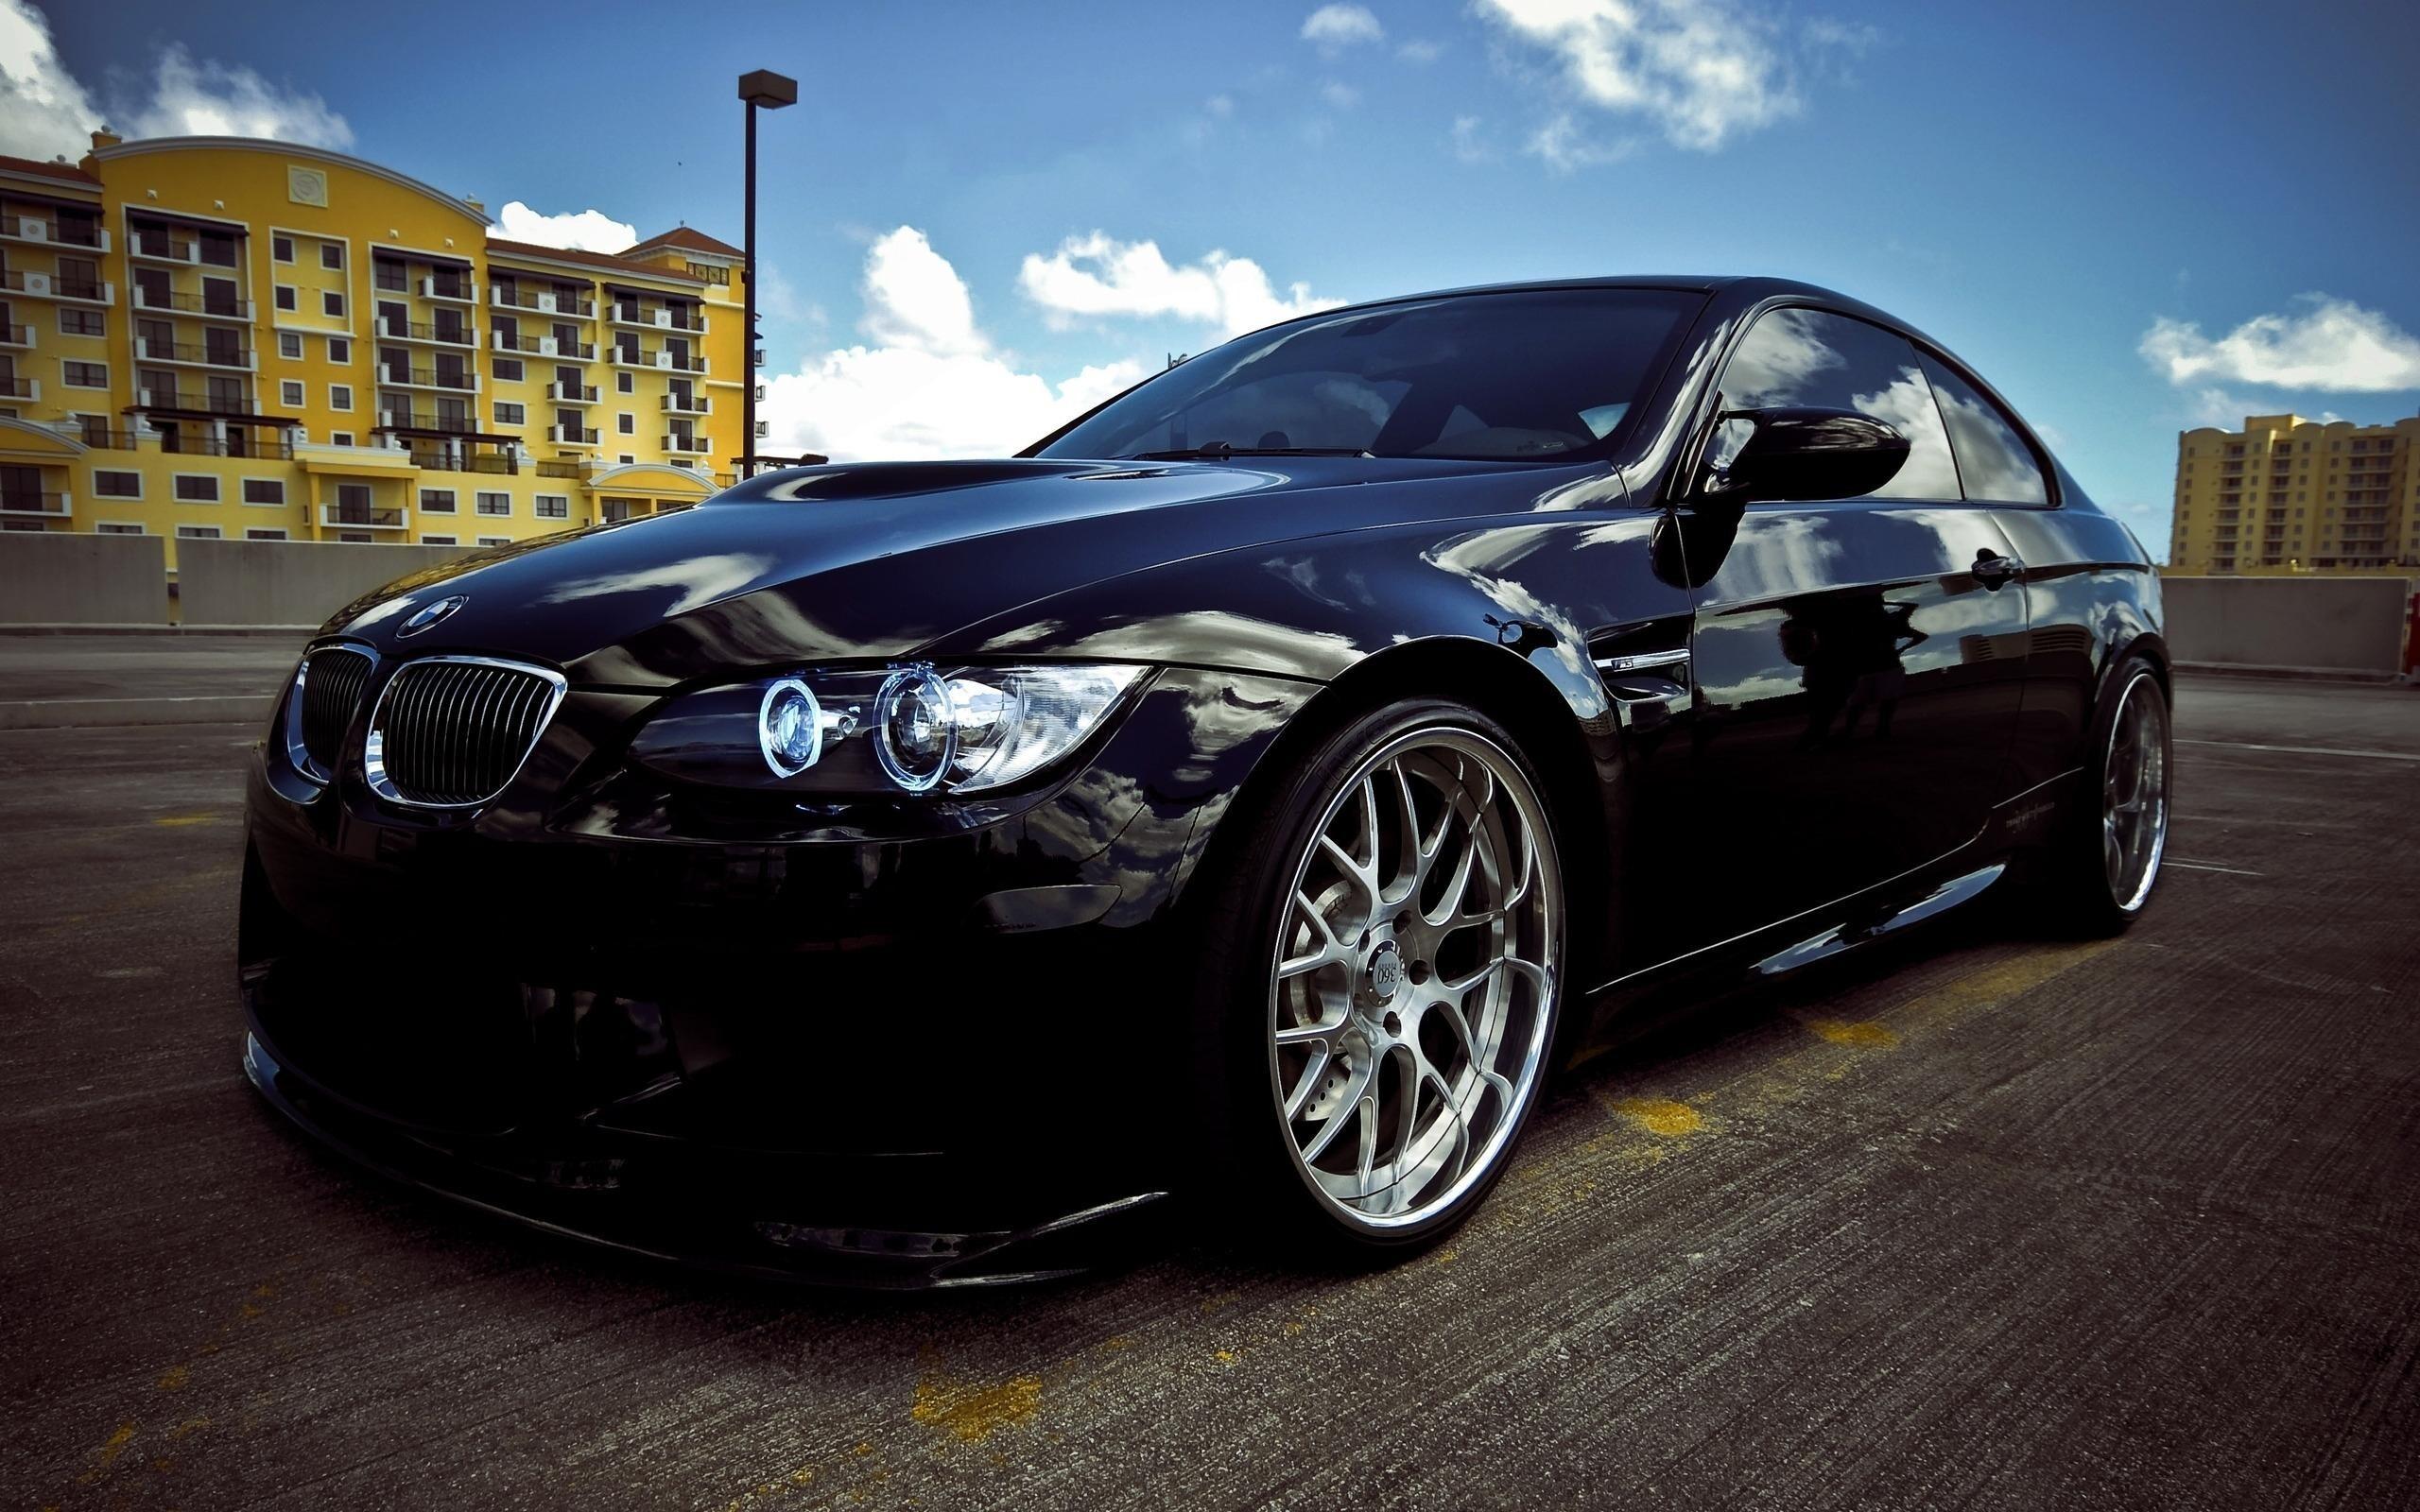 BMW M3 Dark Black Wallpaper | HD Wallpapers